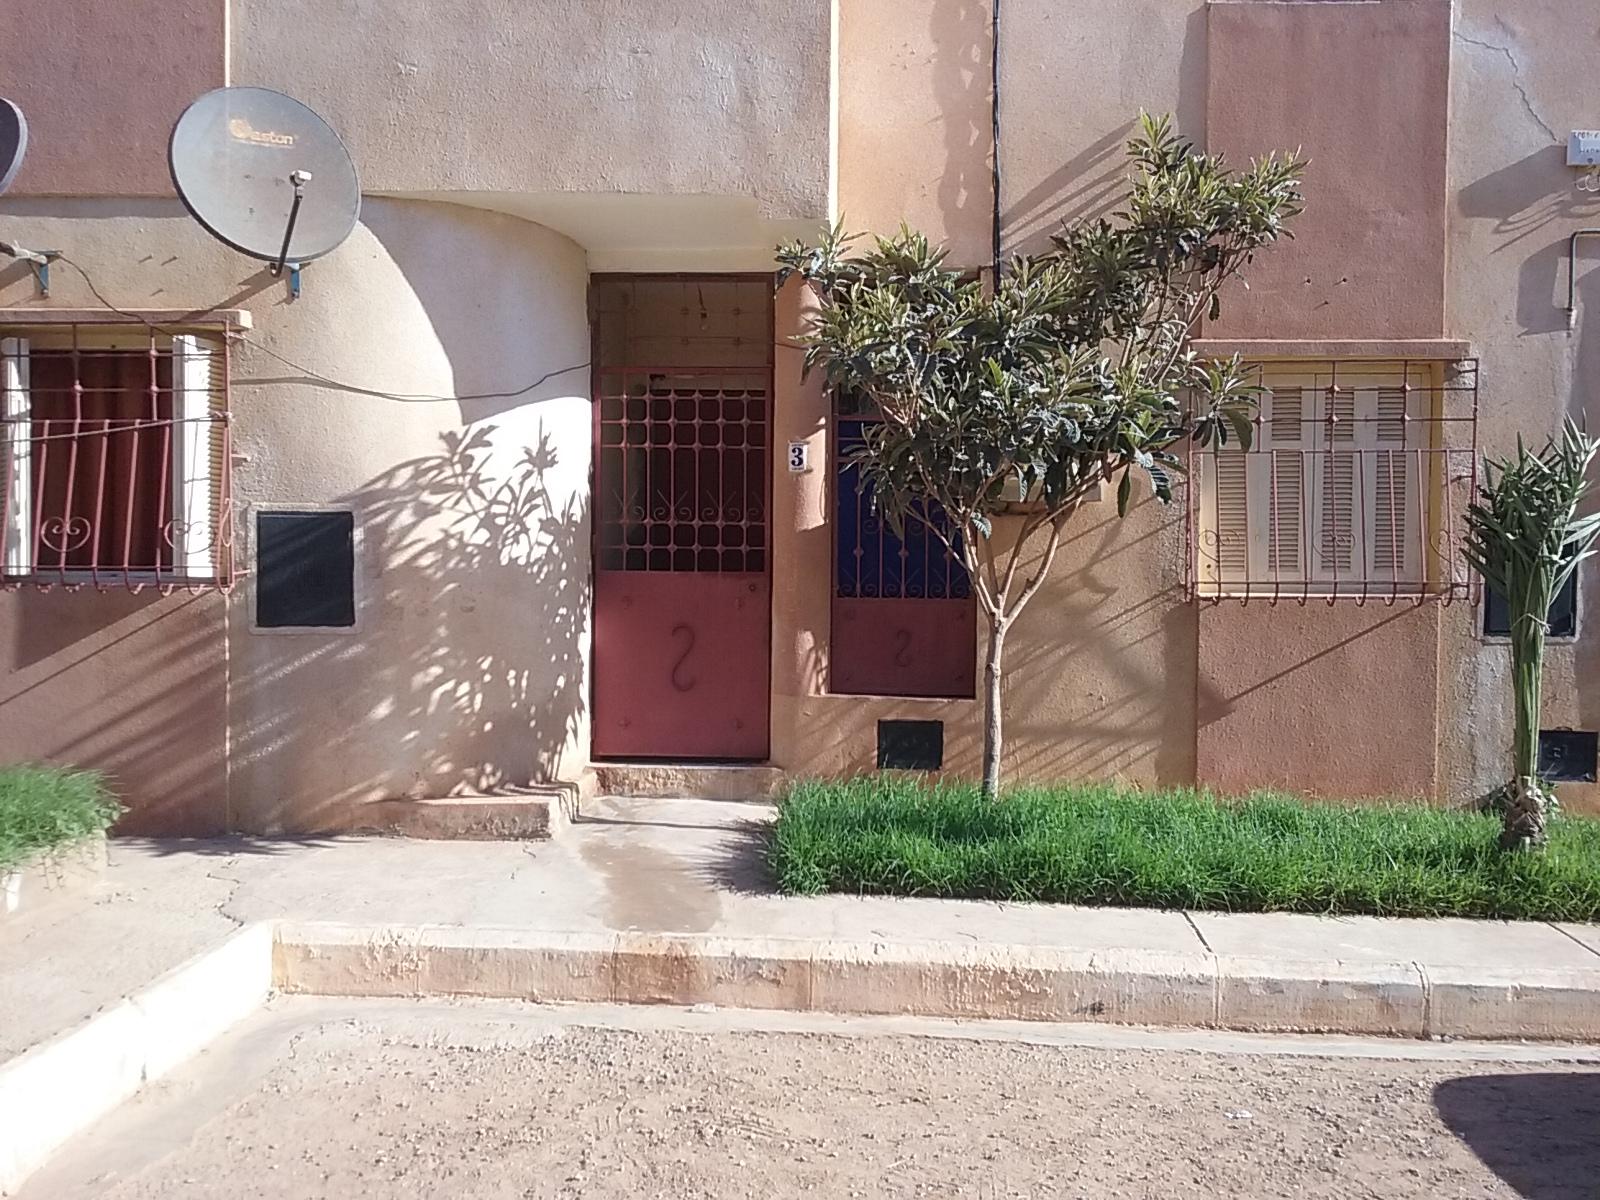 Faience Algerie Cuisine Prix : Vente villa à hadjadj mostaganem algérie